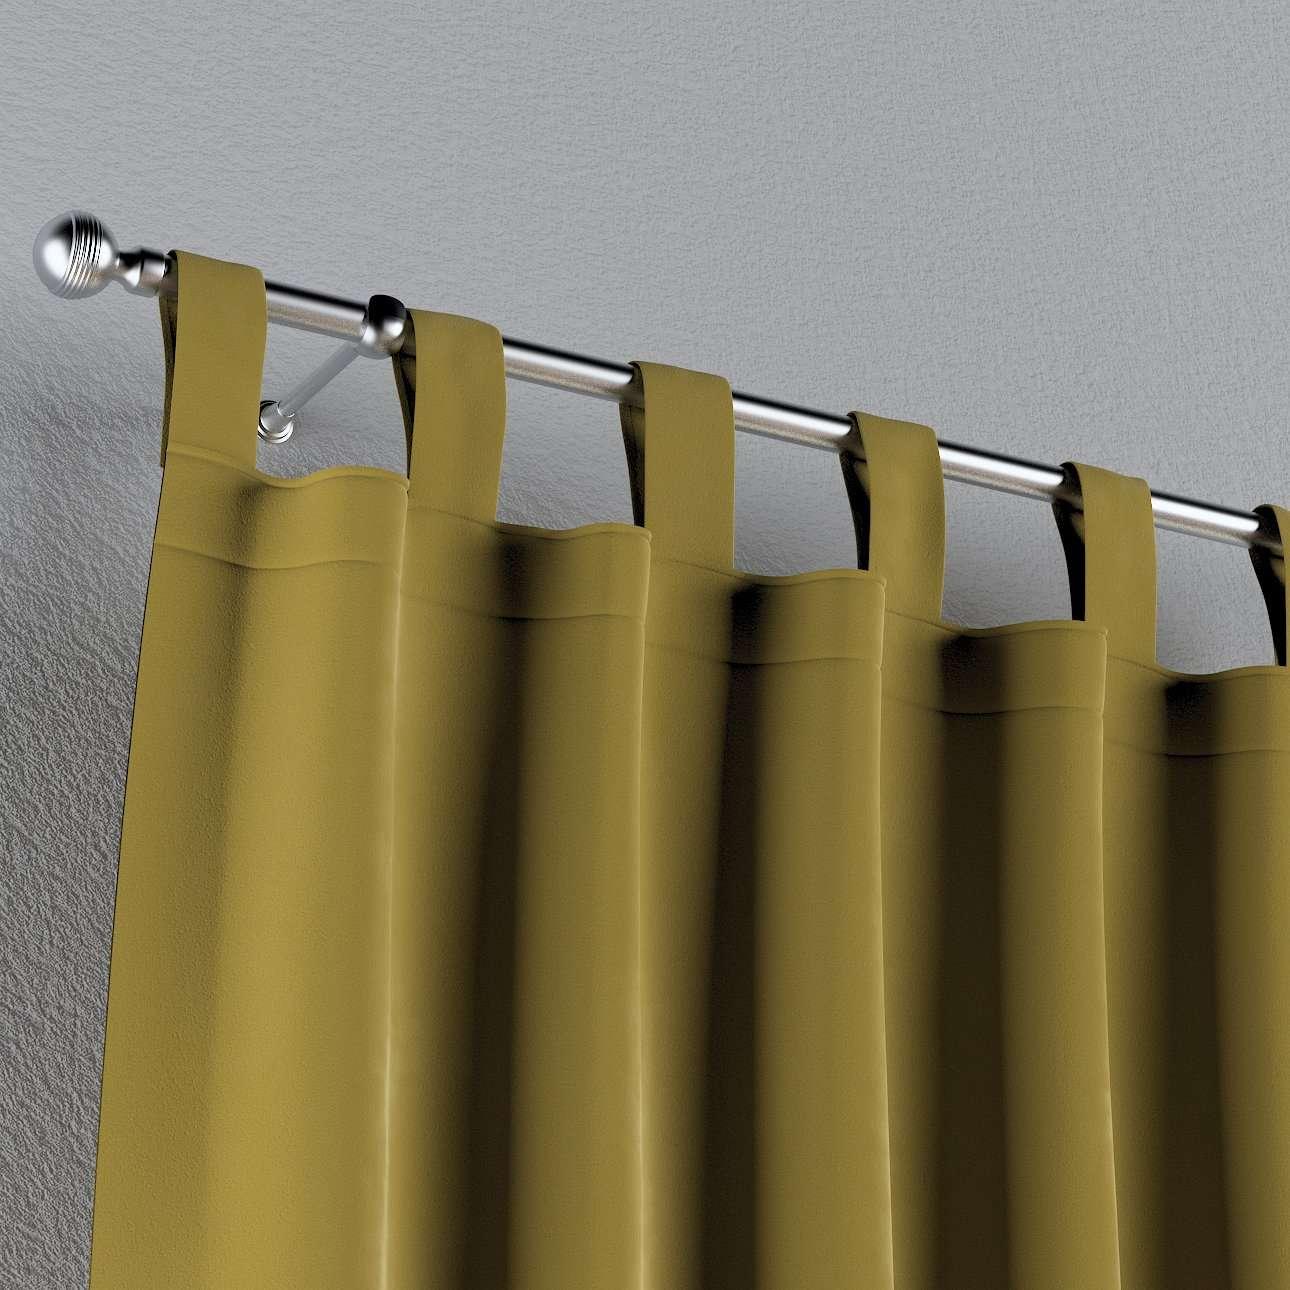 Zasłona na szelkach 1 szt. w kolekcji Velvet, tkanina: 704-27